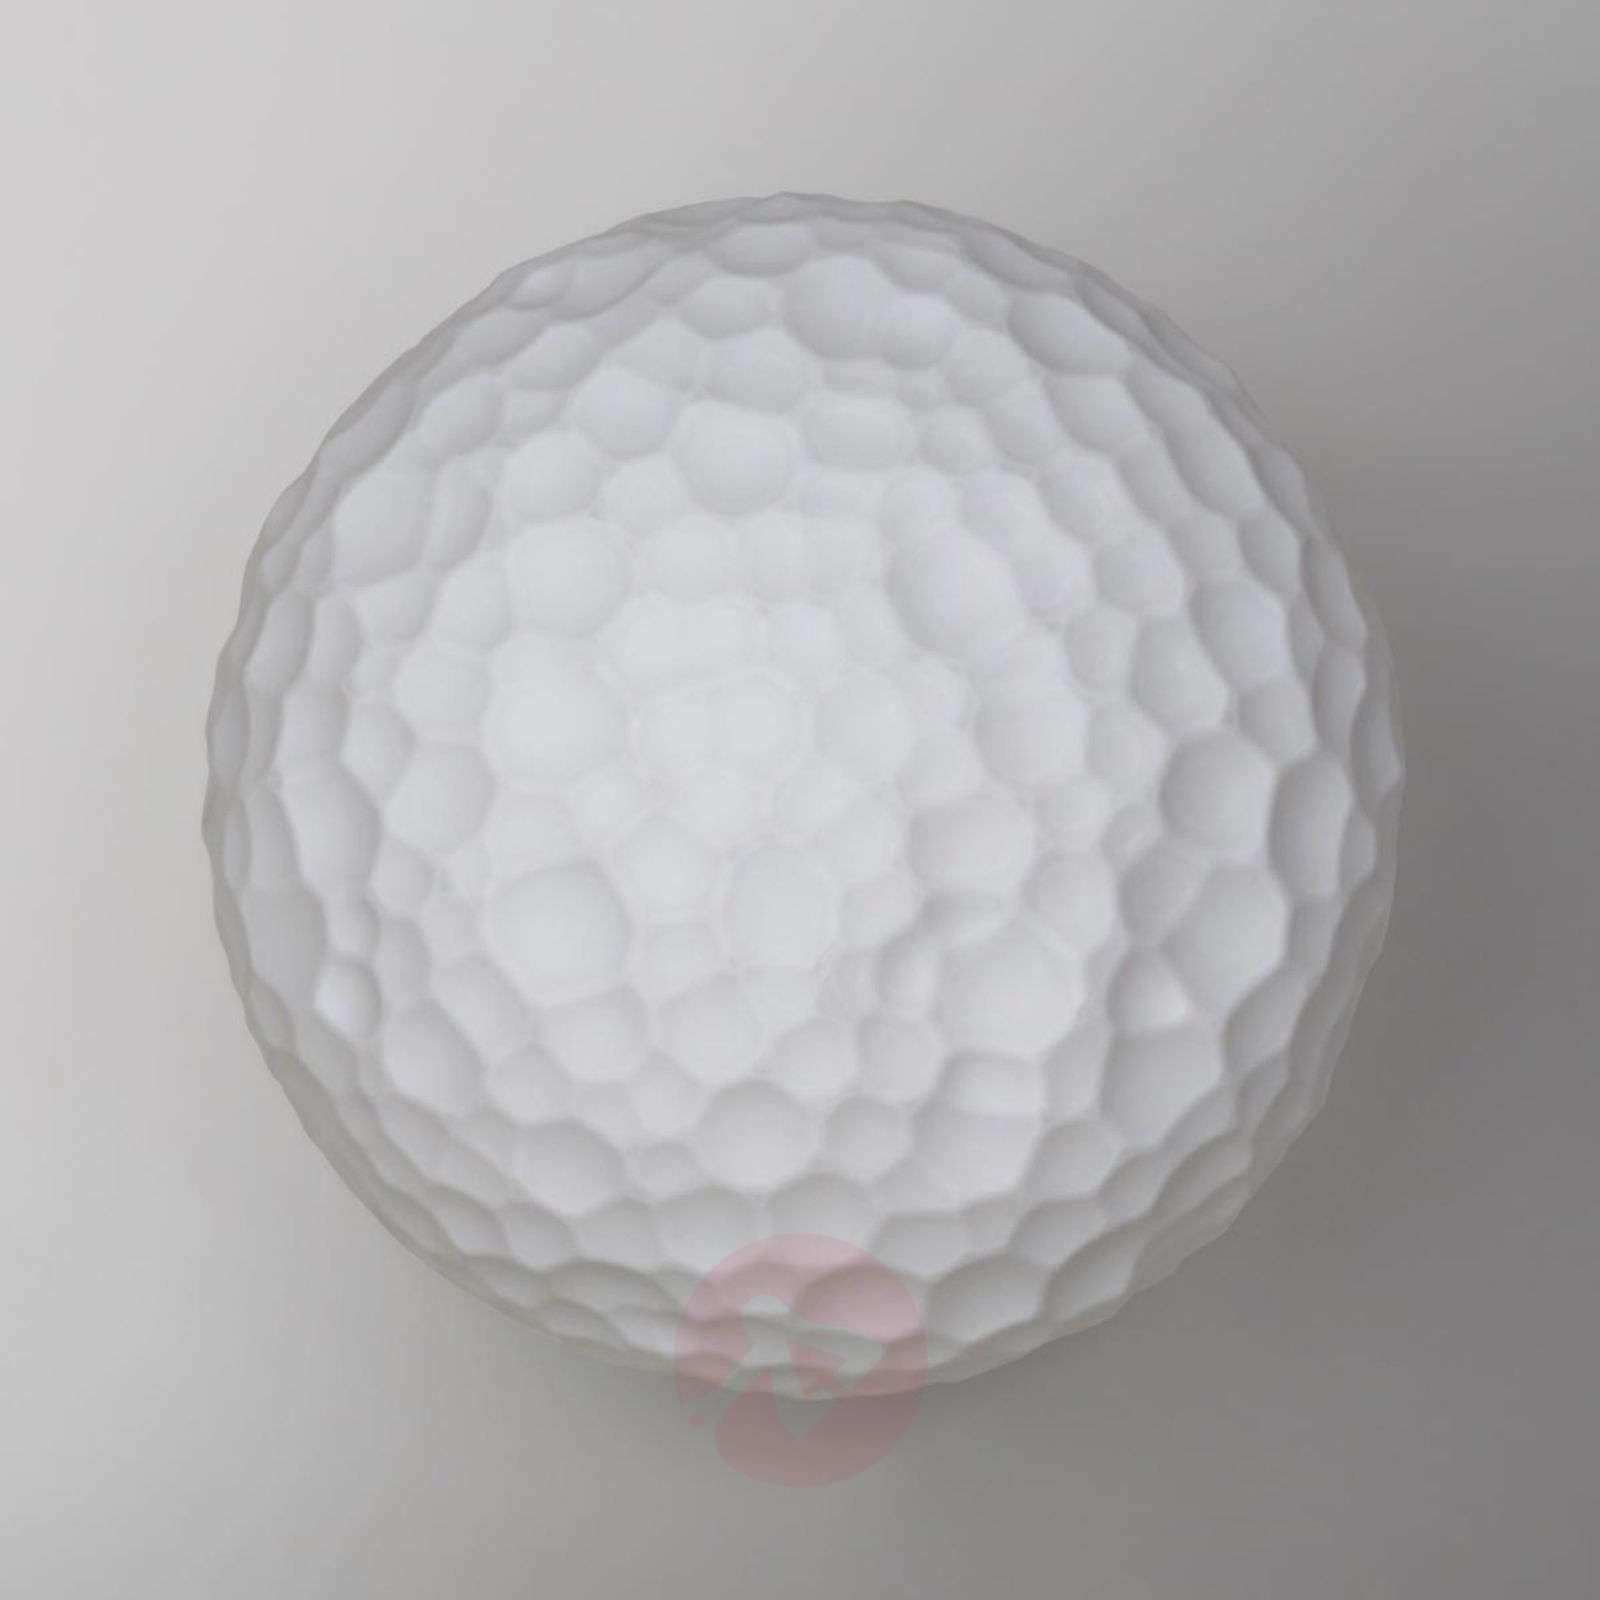 Meteorite glass wall light, 35 cm-1060039-01